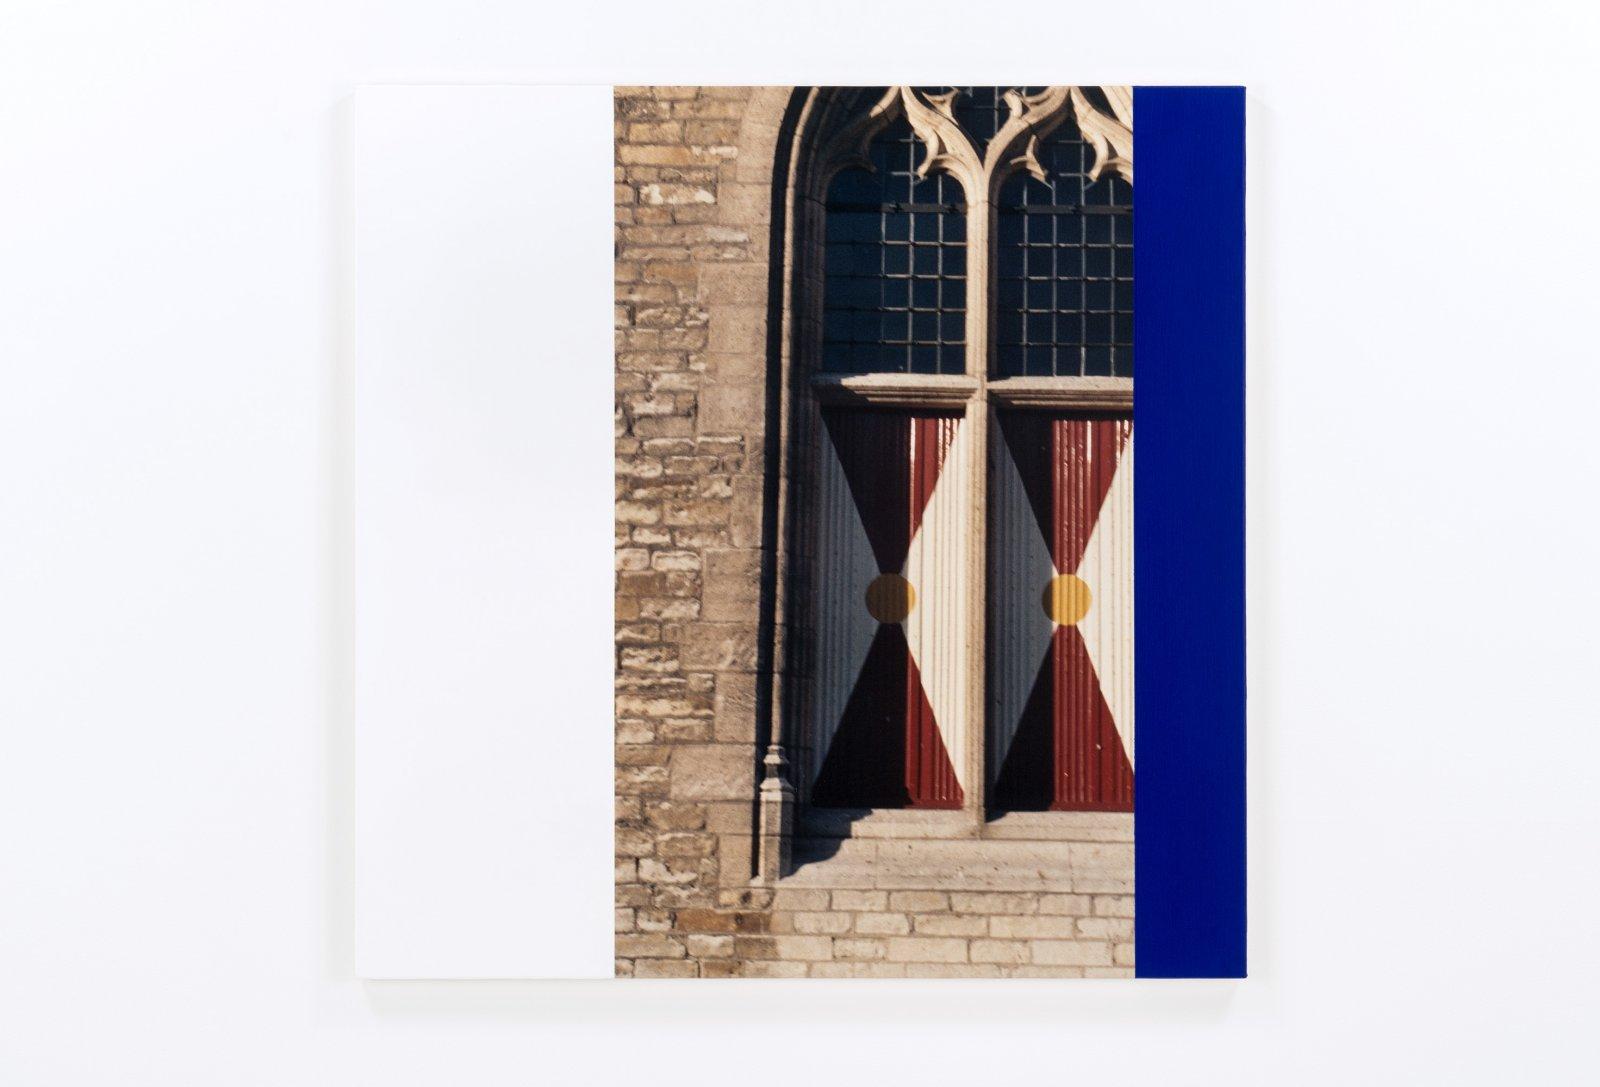 Ian Wallace,Hommage a Mondrian IX(Windows), 1990, photolaminate and acrylic on canvas, 48 x 48 in. (122 x 122 cm)